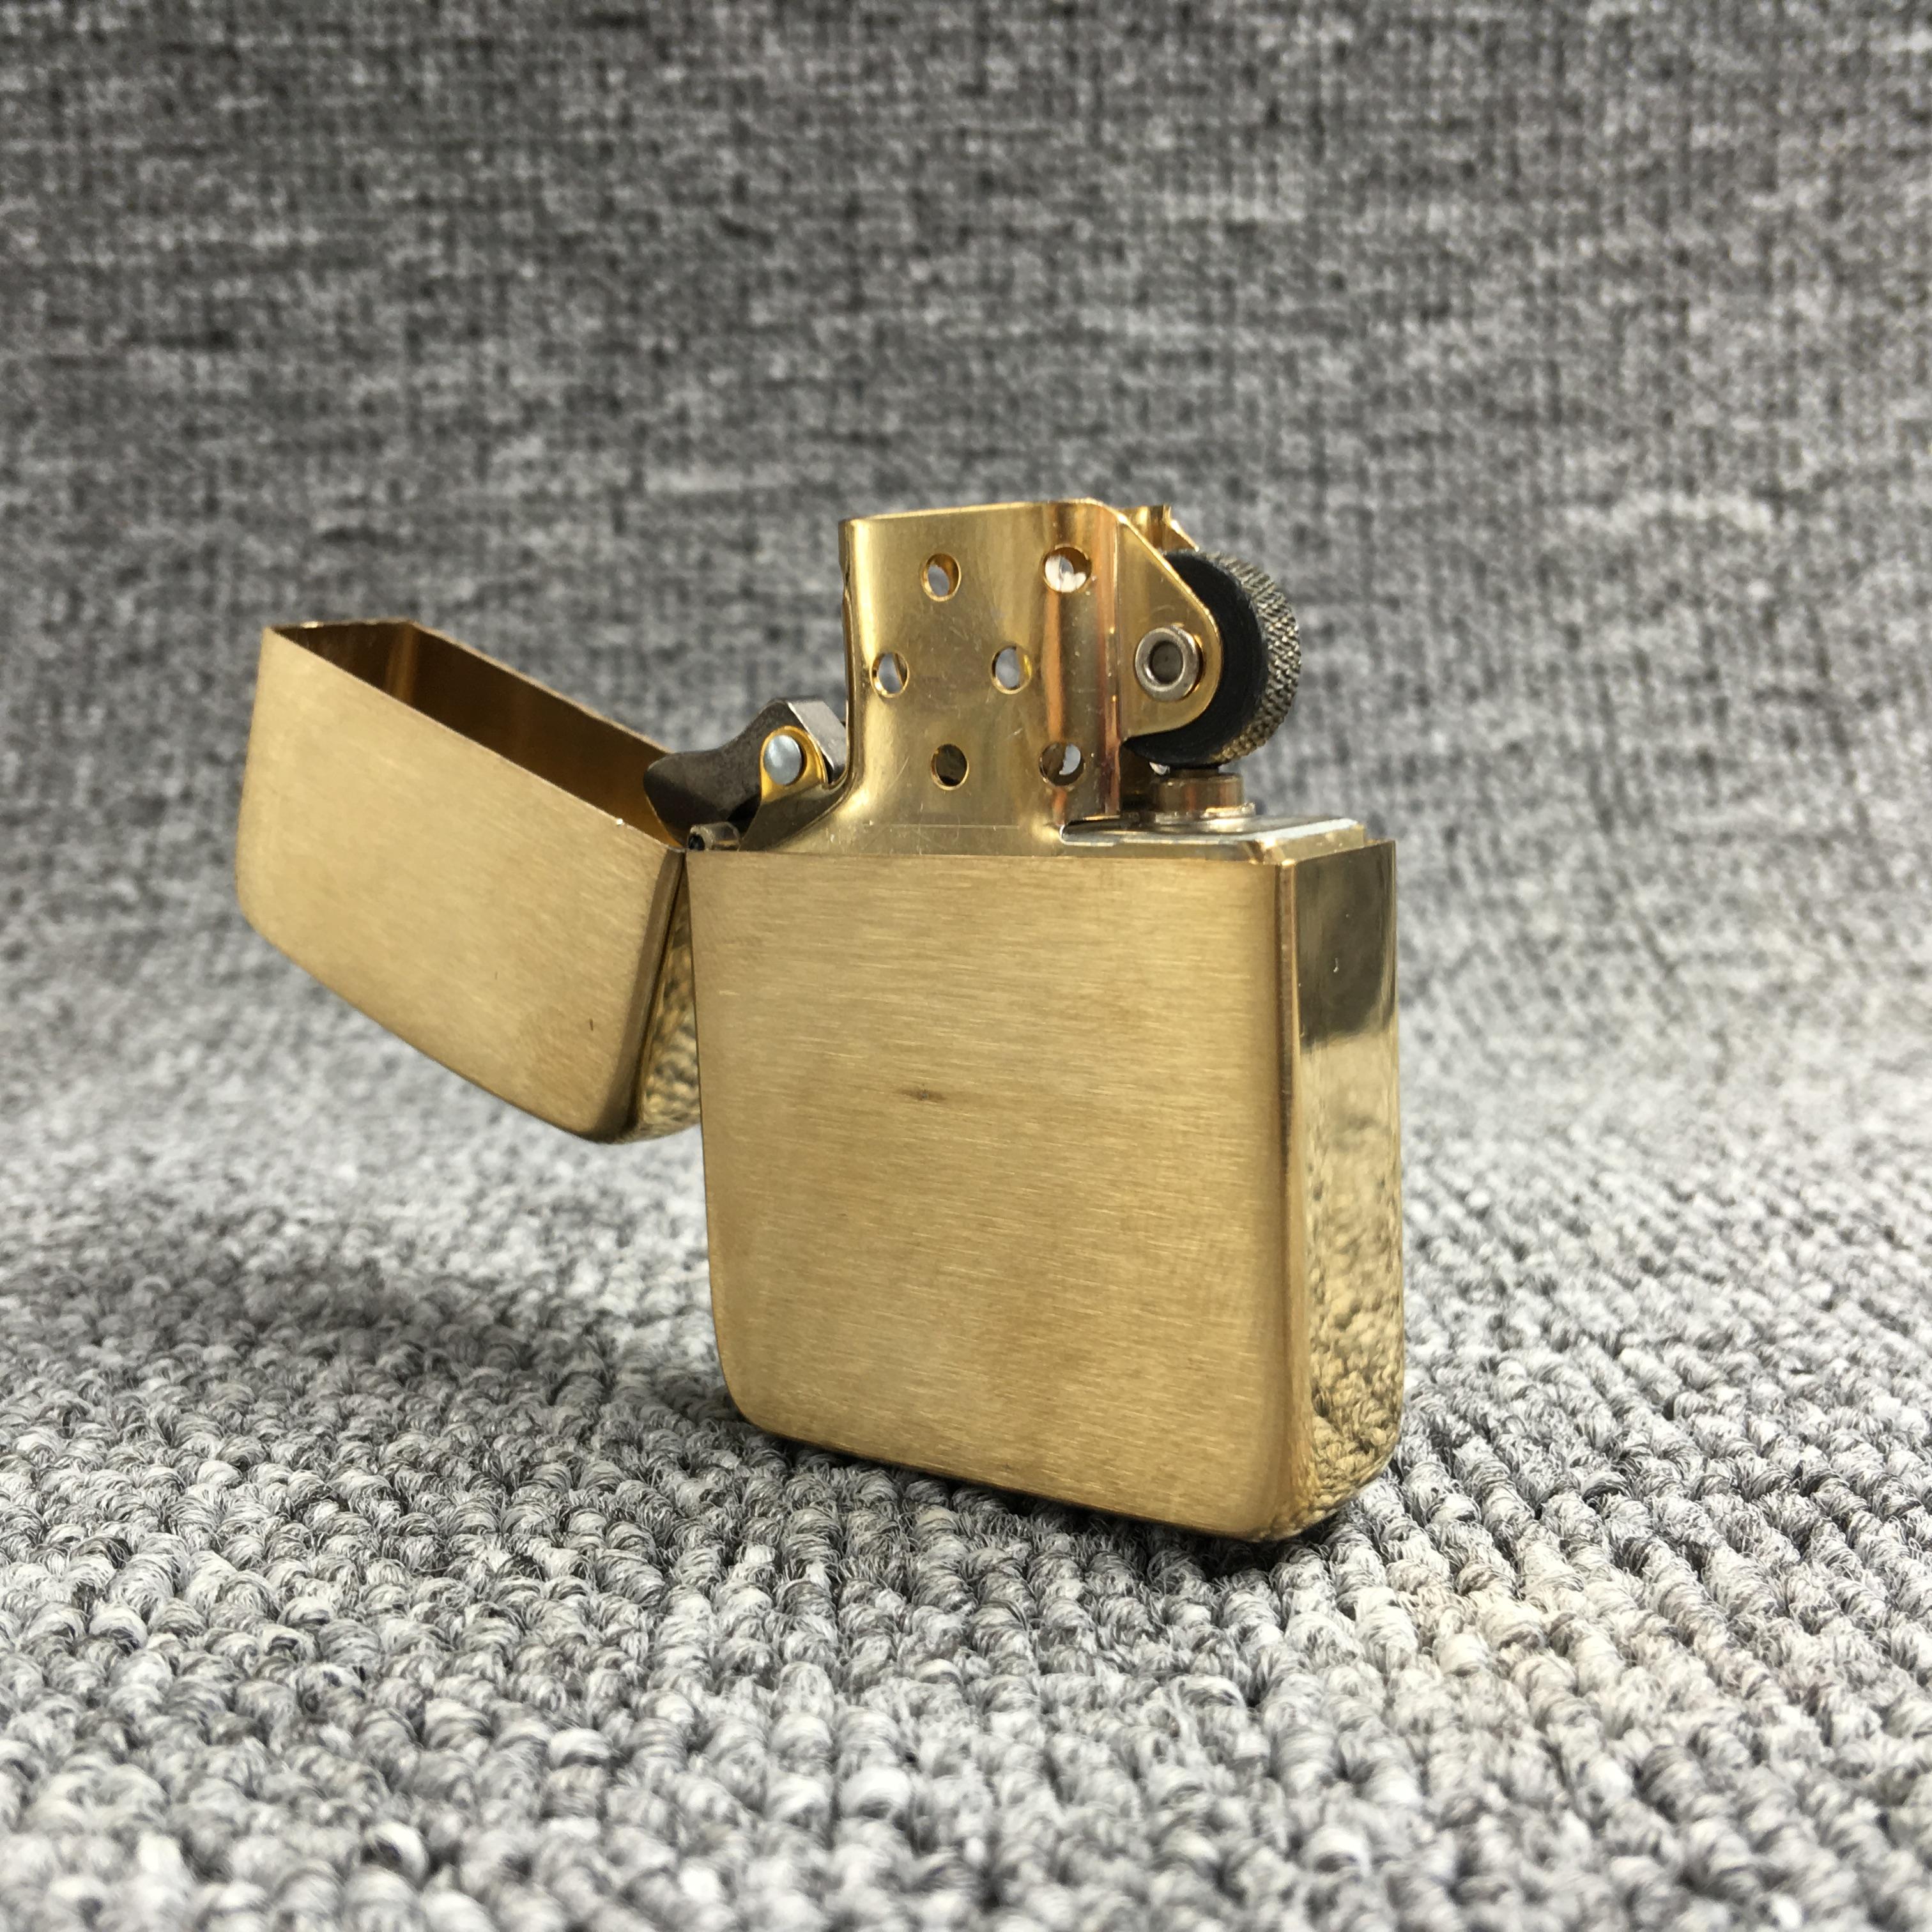 zippo打火机原装正品纯铜复刻版1941B二战拉丝光板煤油打火机包邮